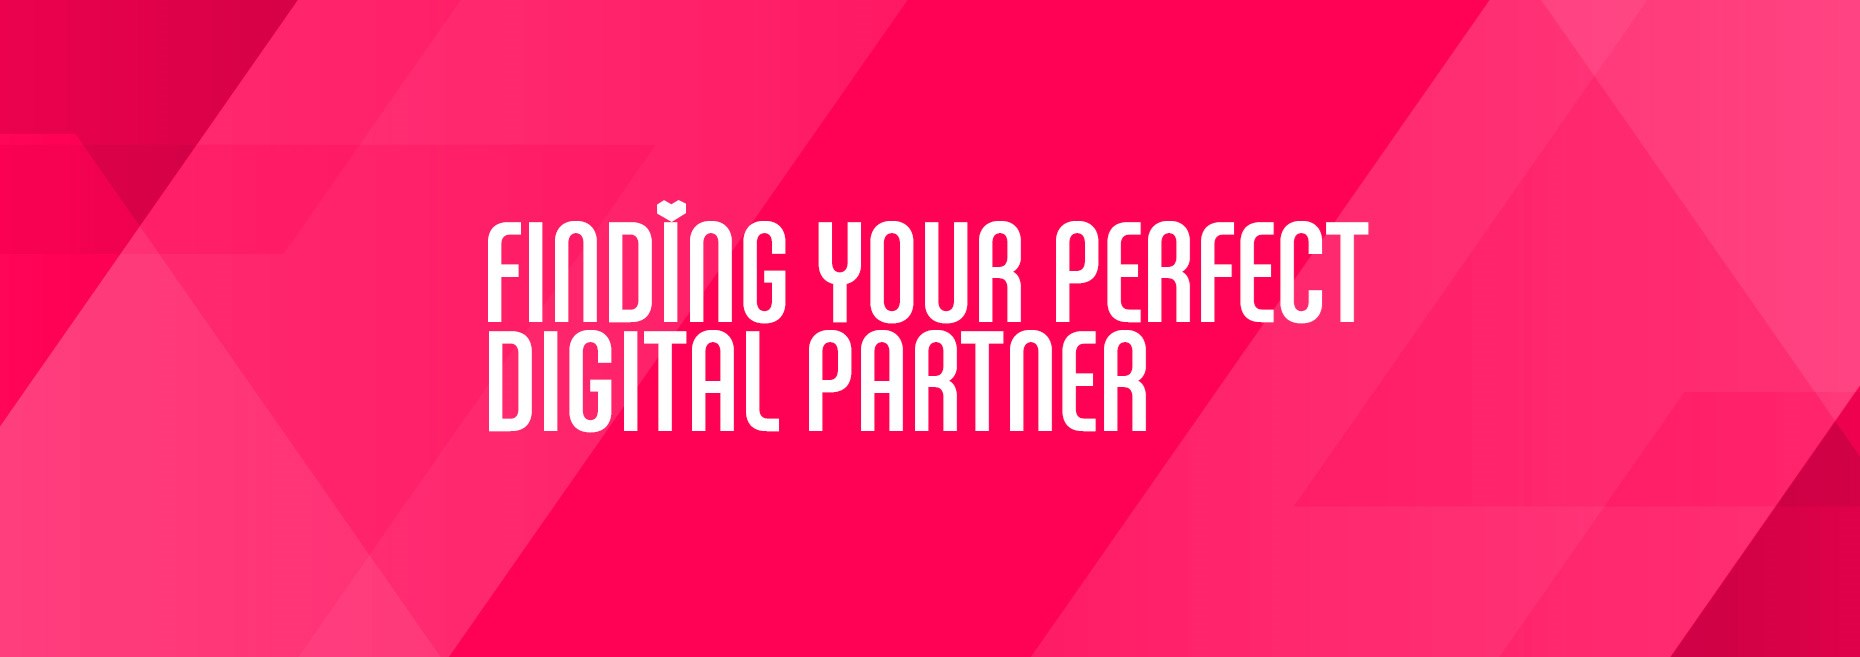 herofindperfectdigitalpartners.jpg